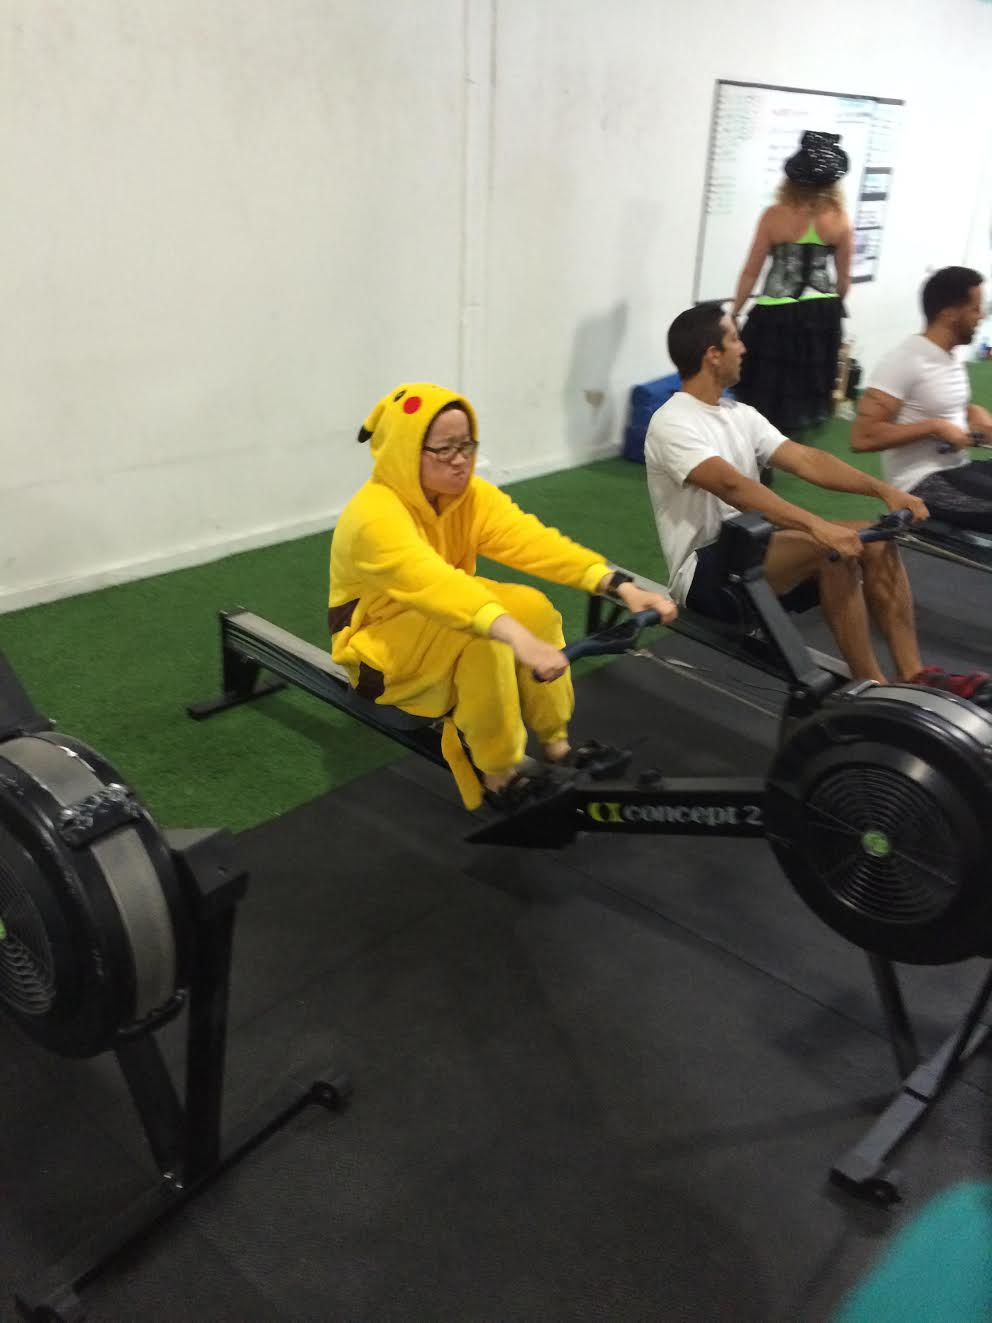 Go Pikachu, Go!